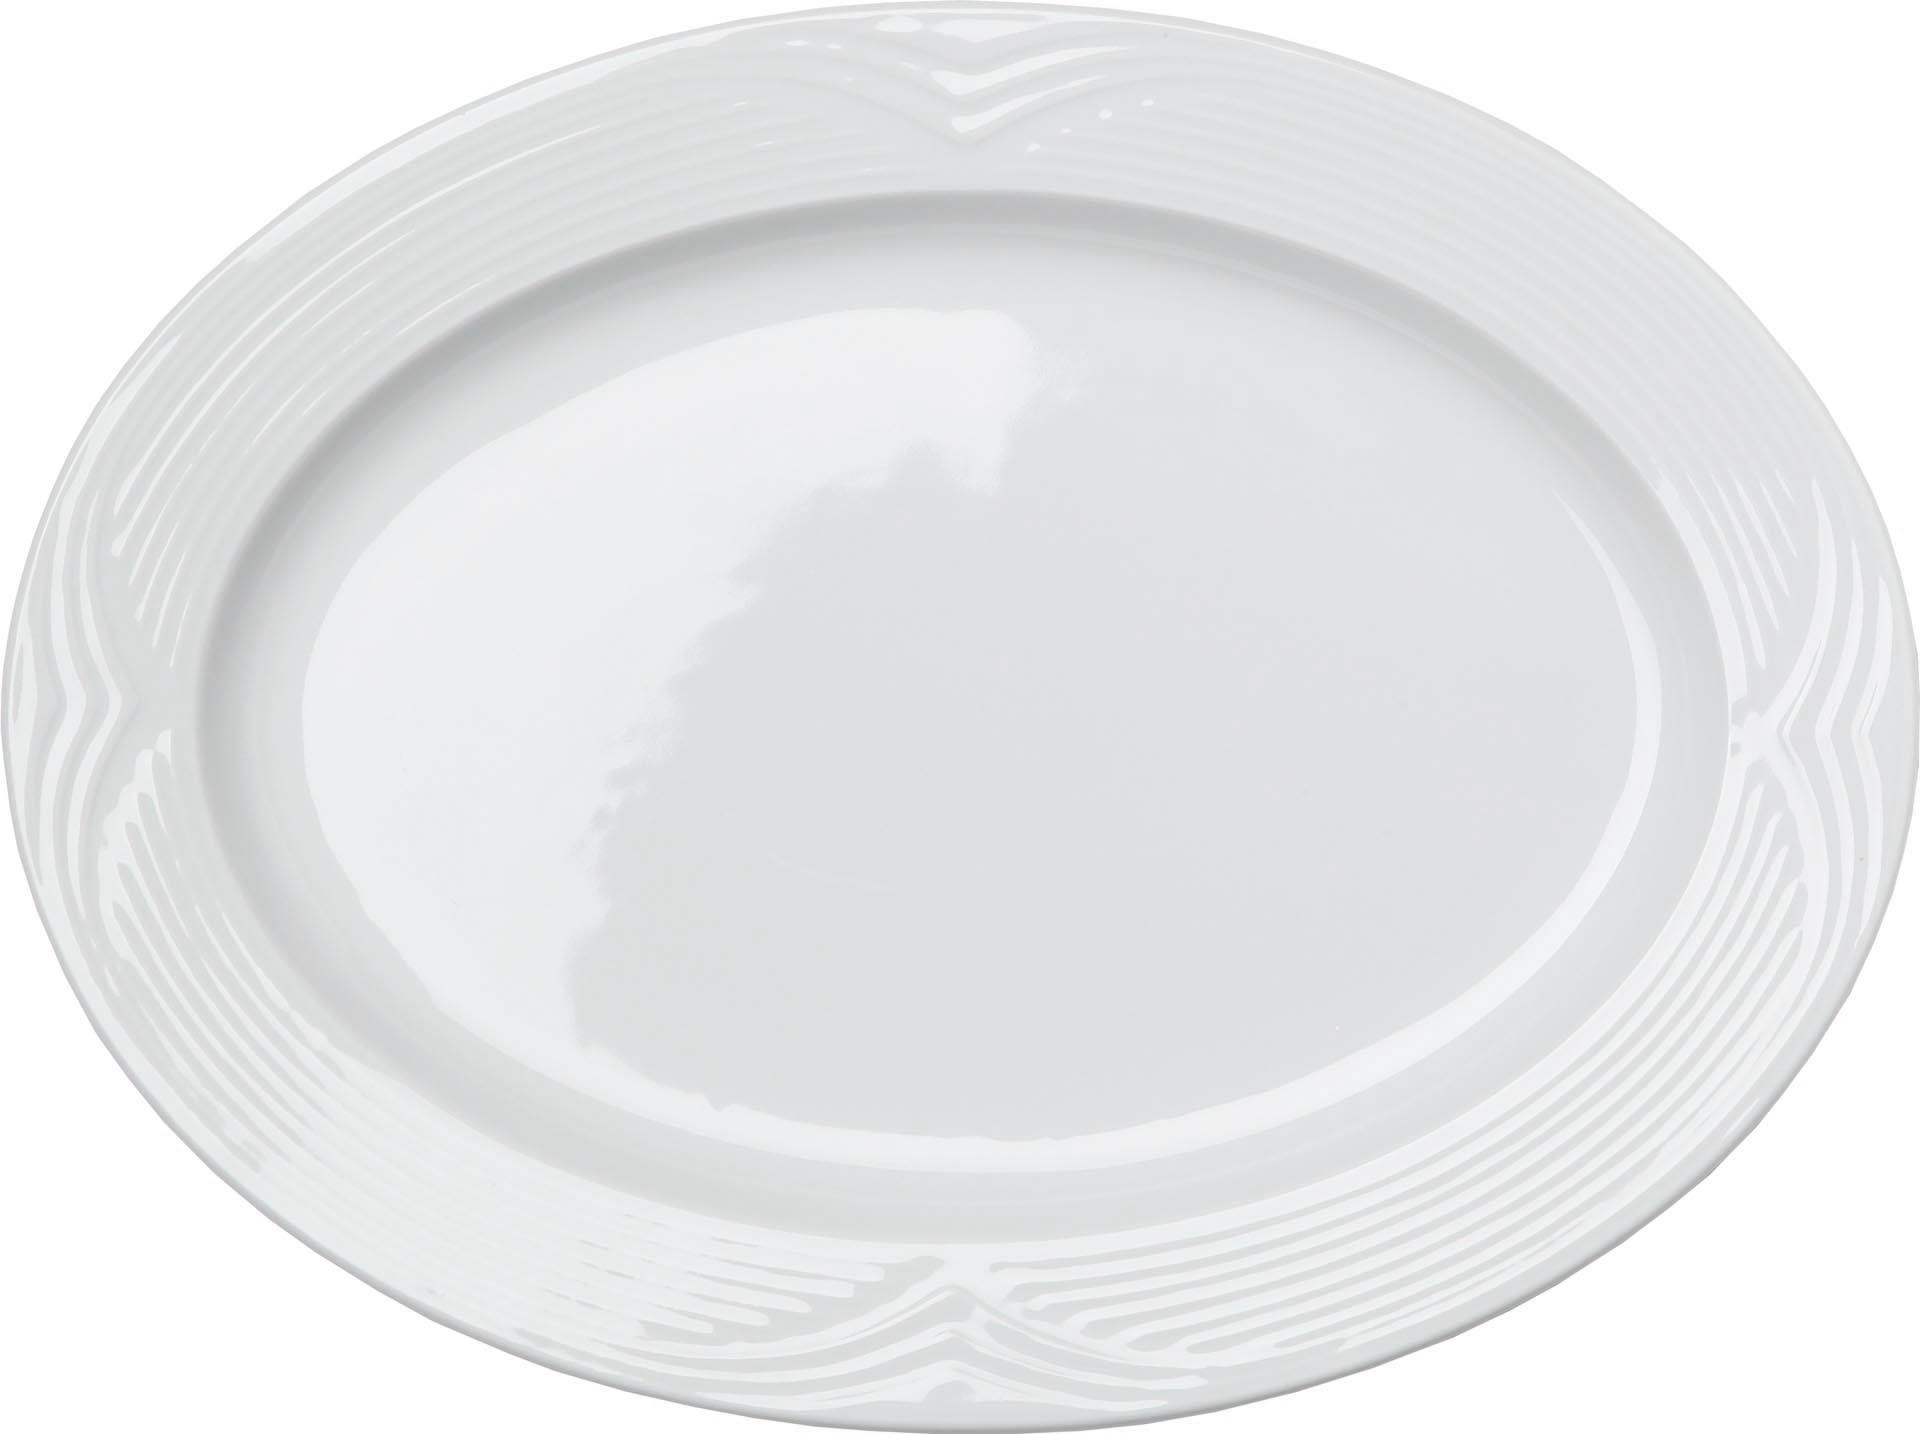 "Platte oval ""Saturnia"" 29 x 20 cm Hotelporzellan"